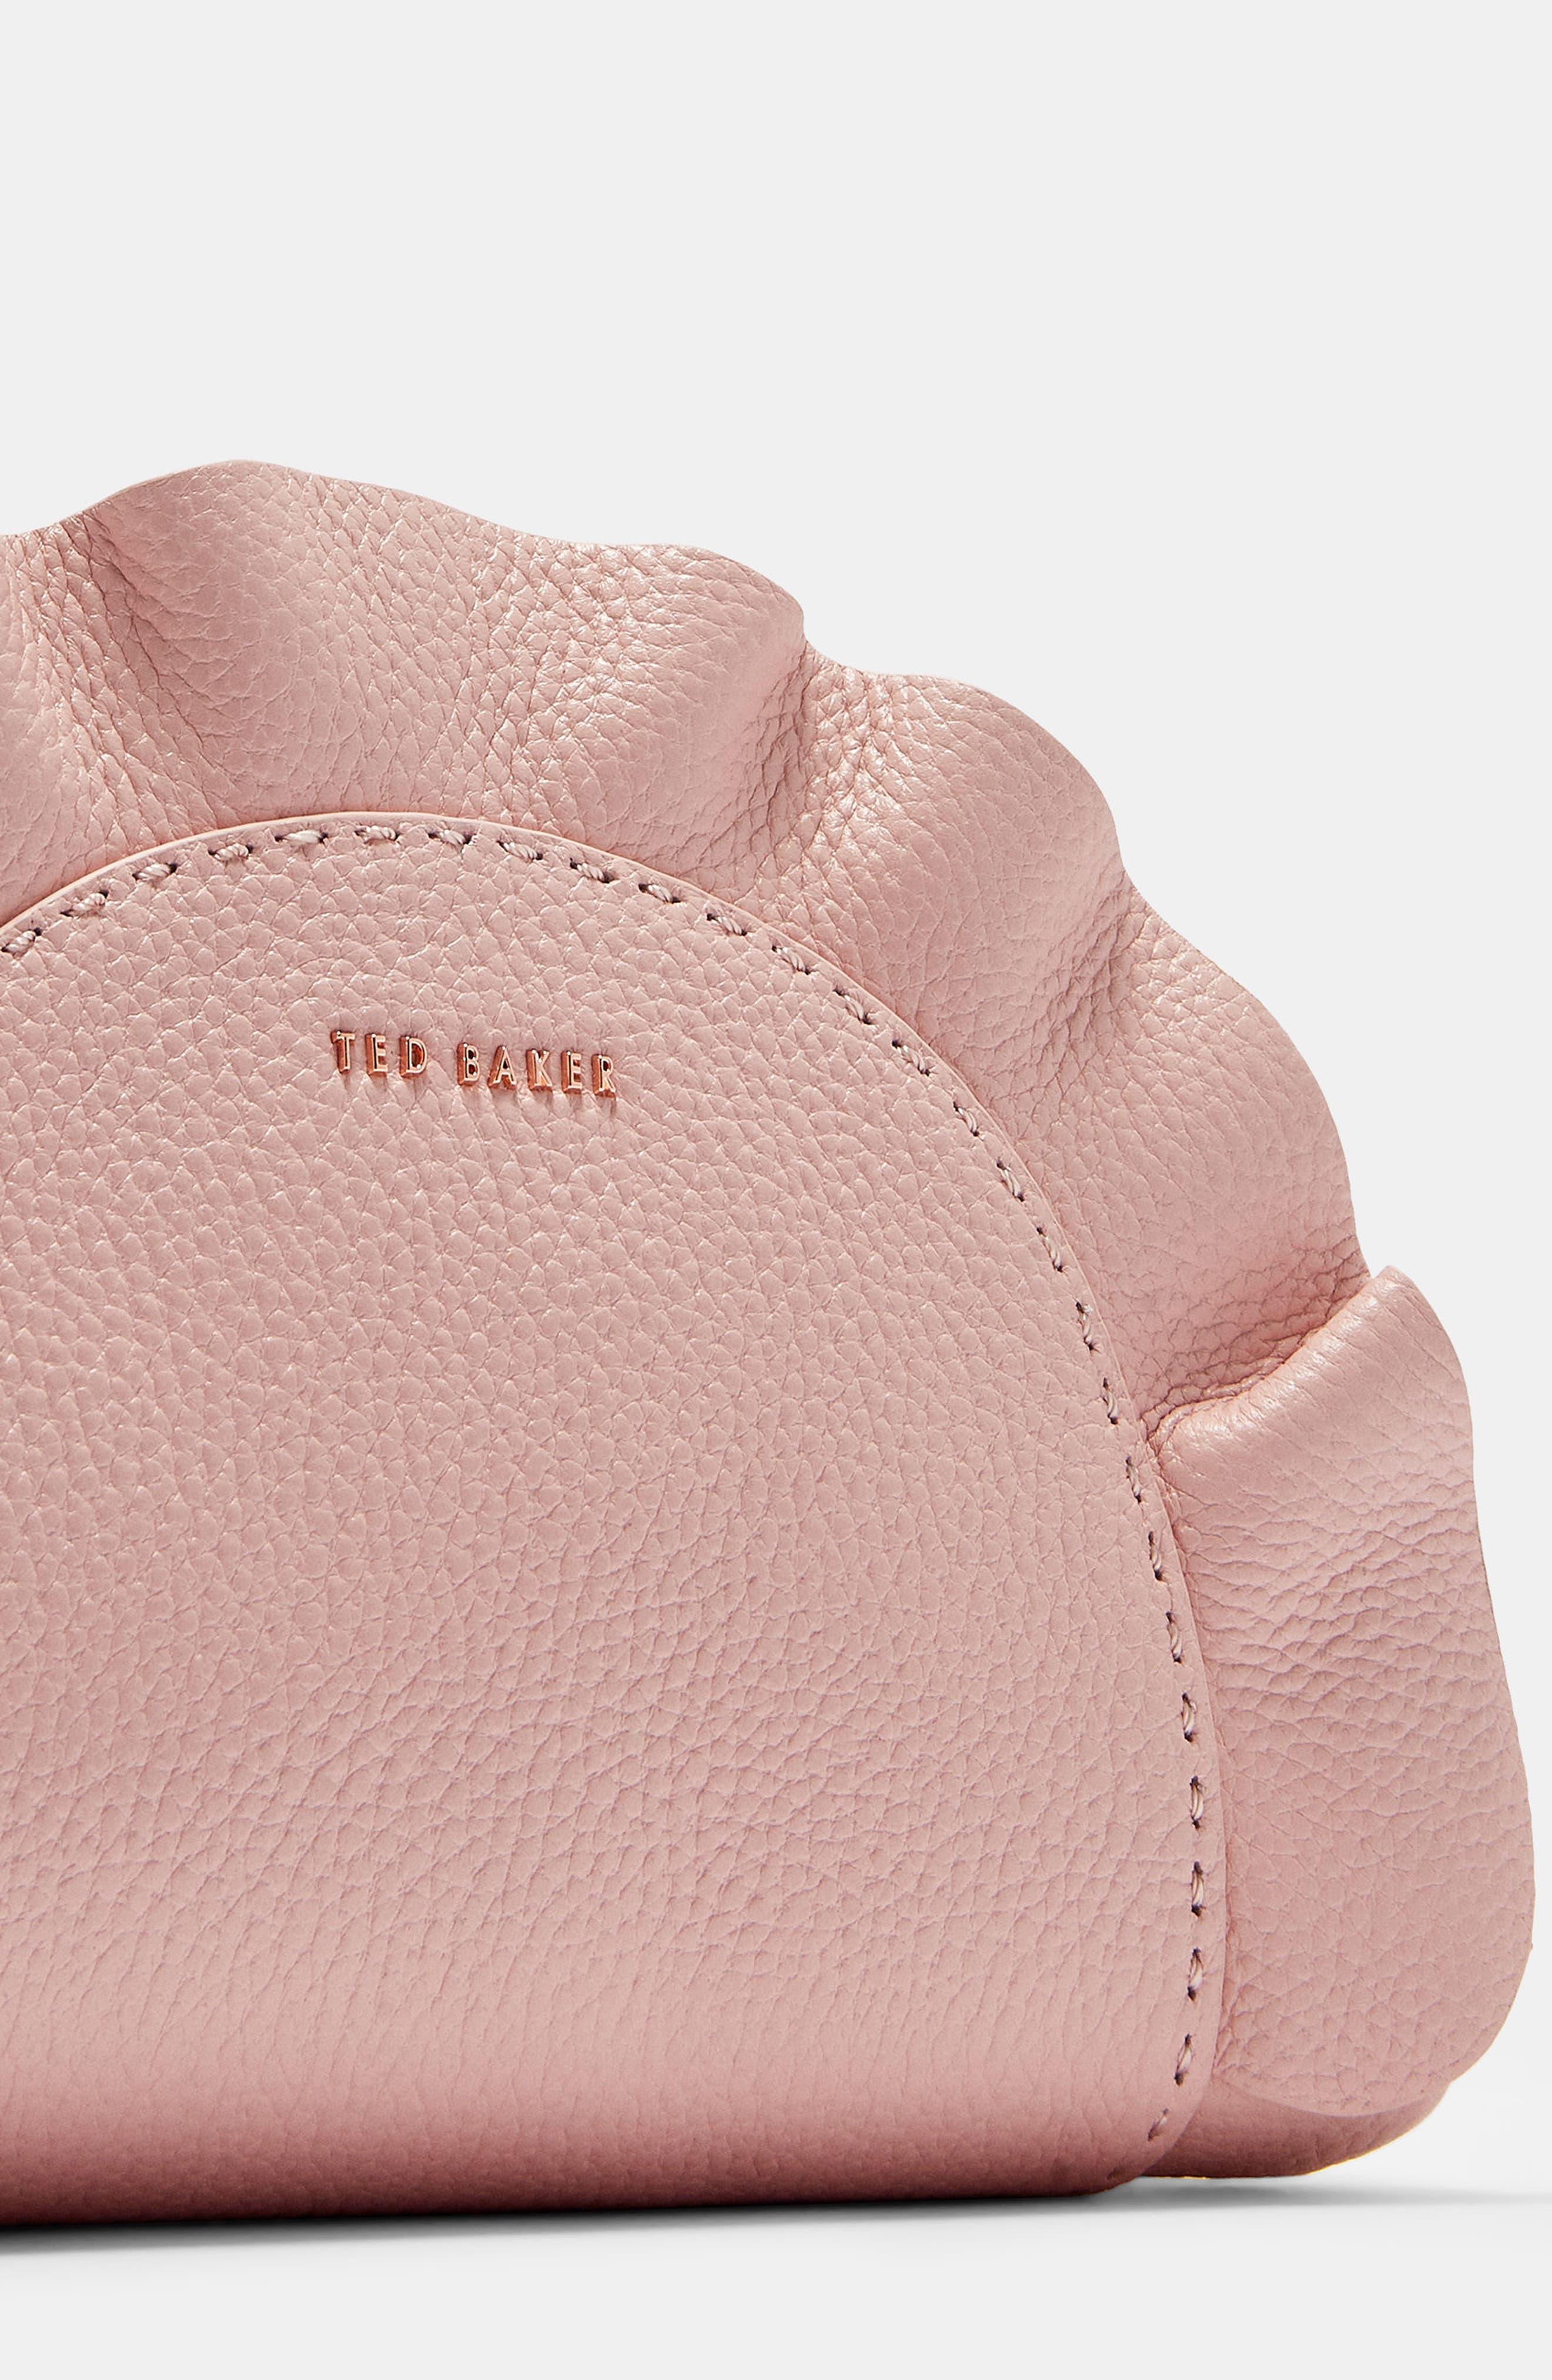 Ruffle Half Moon Leather Crossbody Bag,                             Alternate thumbnail 5, color,                             Light Pink